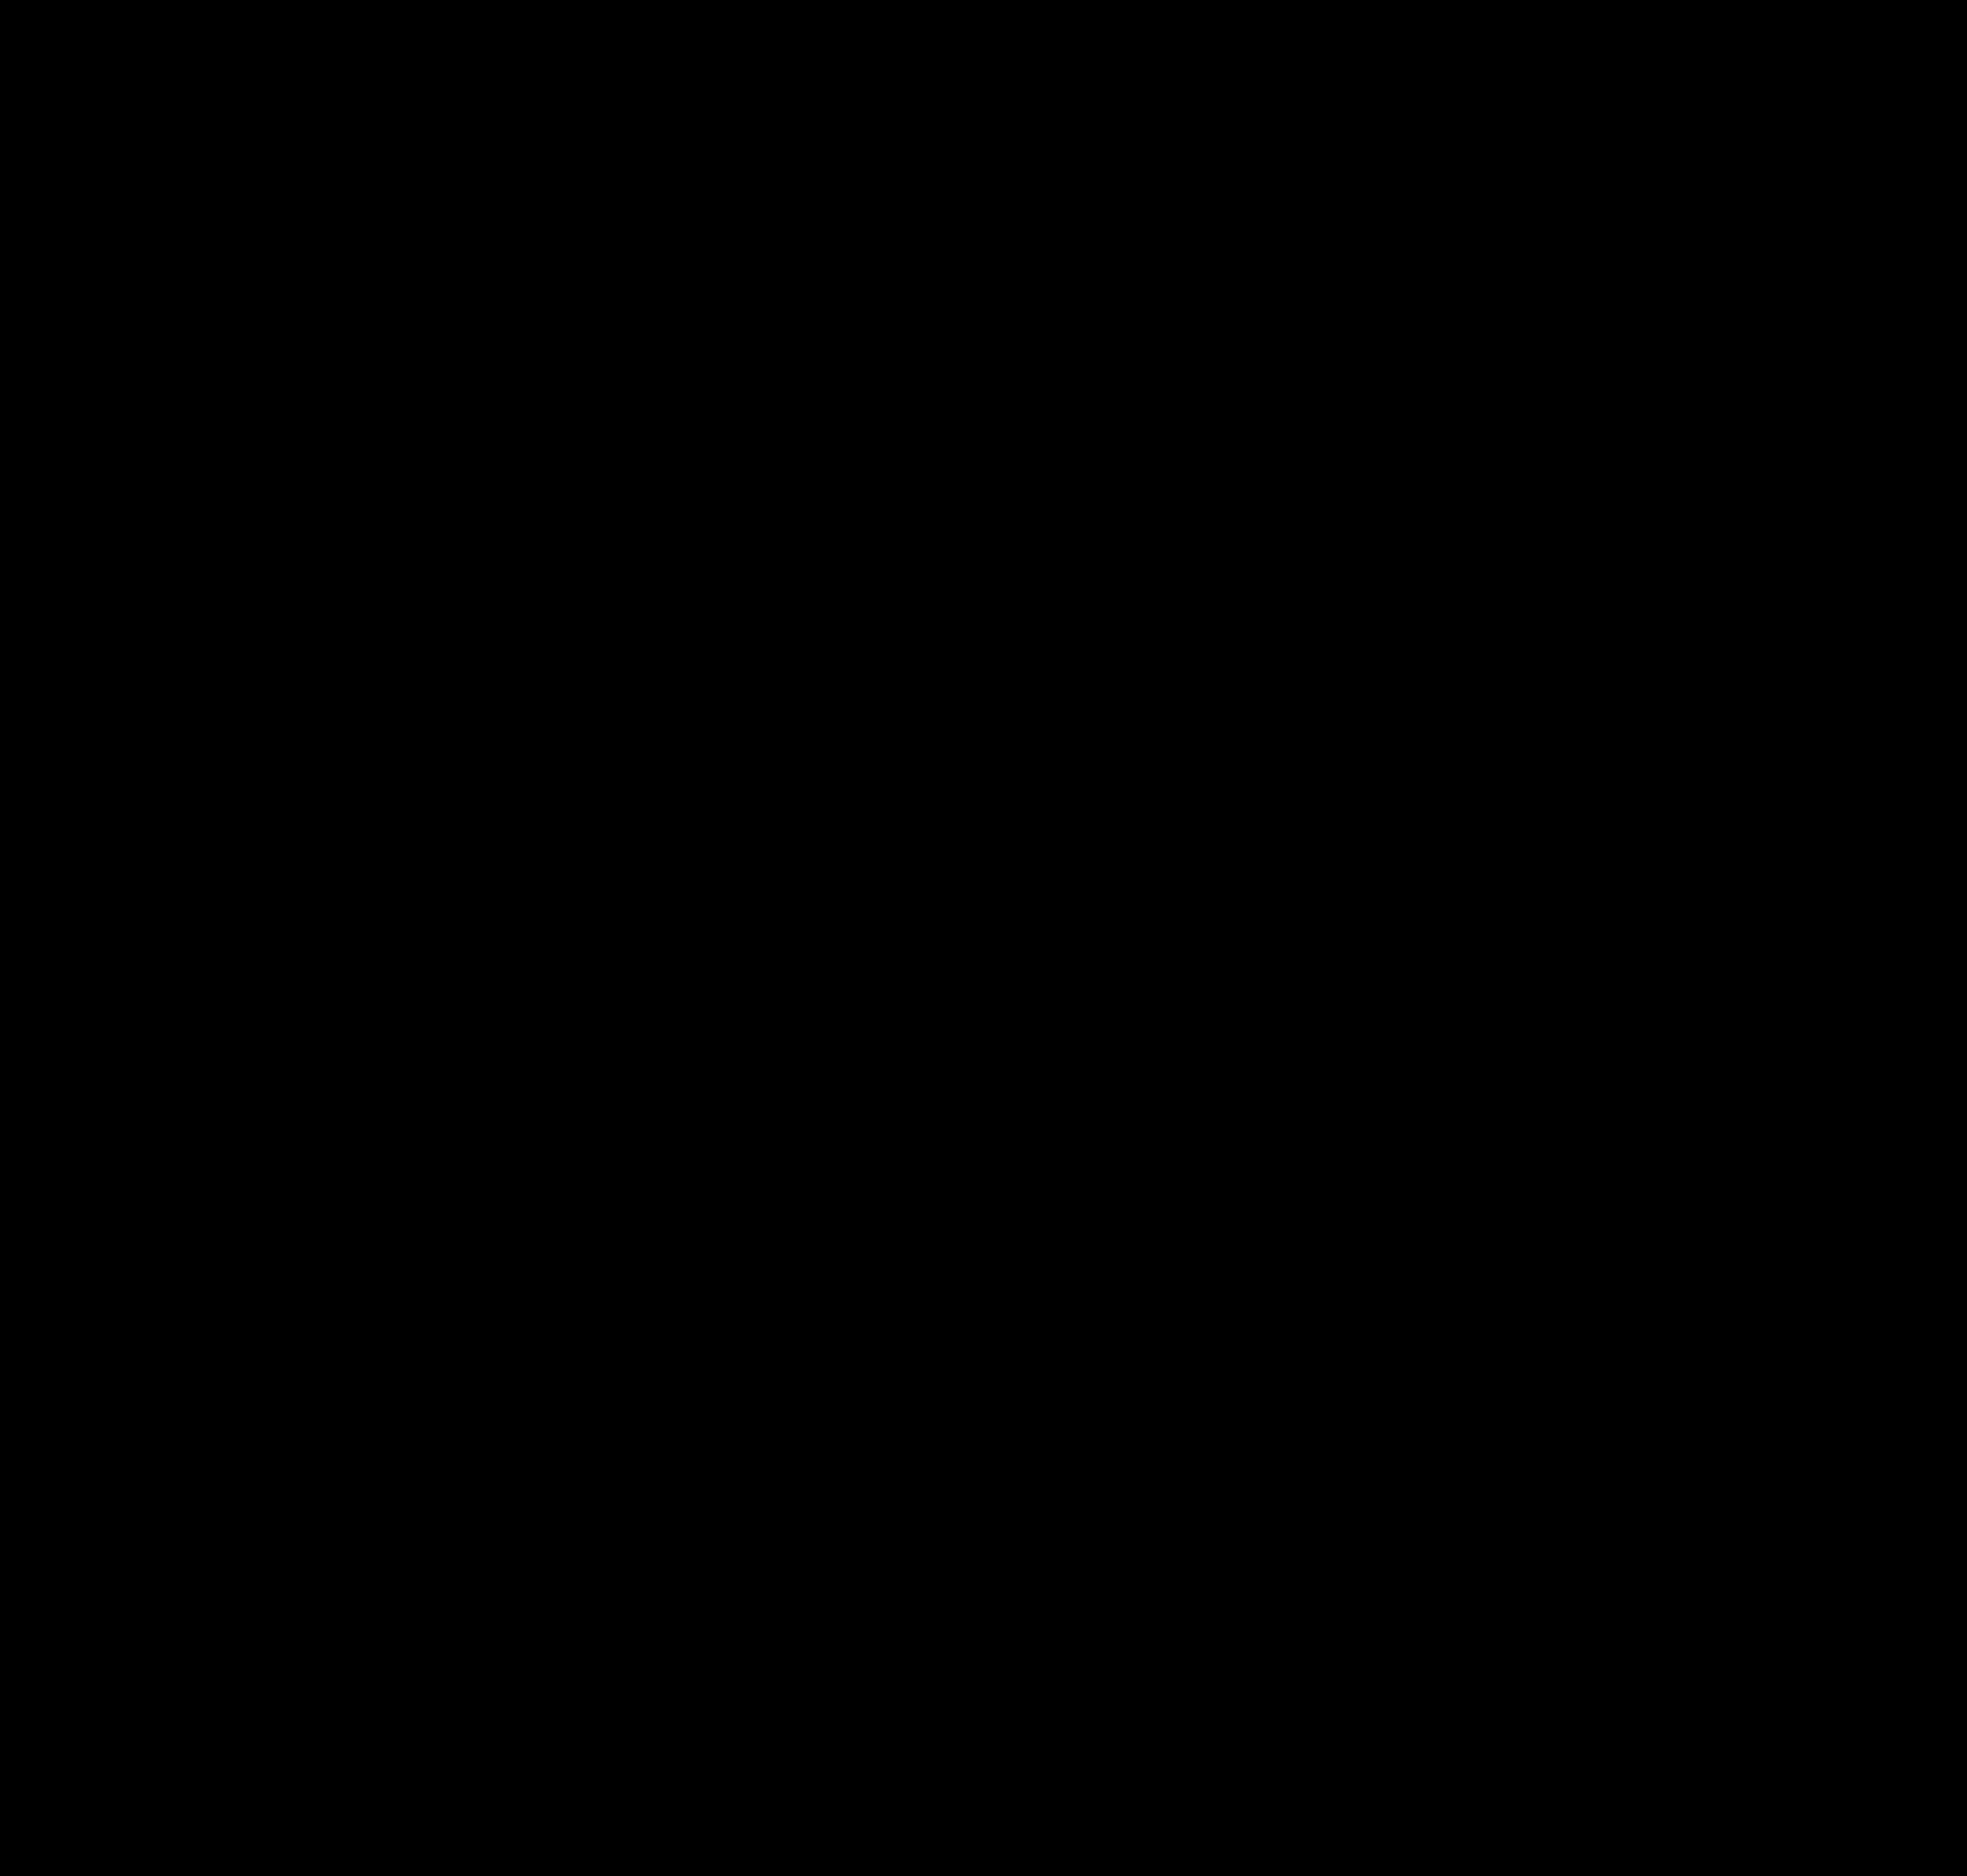 CALIFIORNIA BREAKAWAY